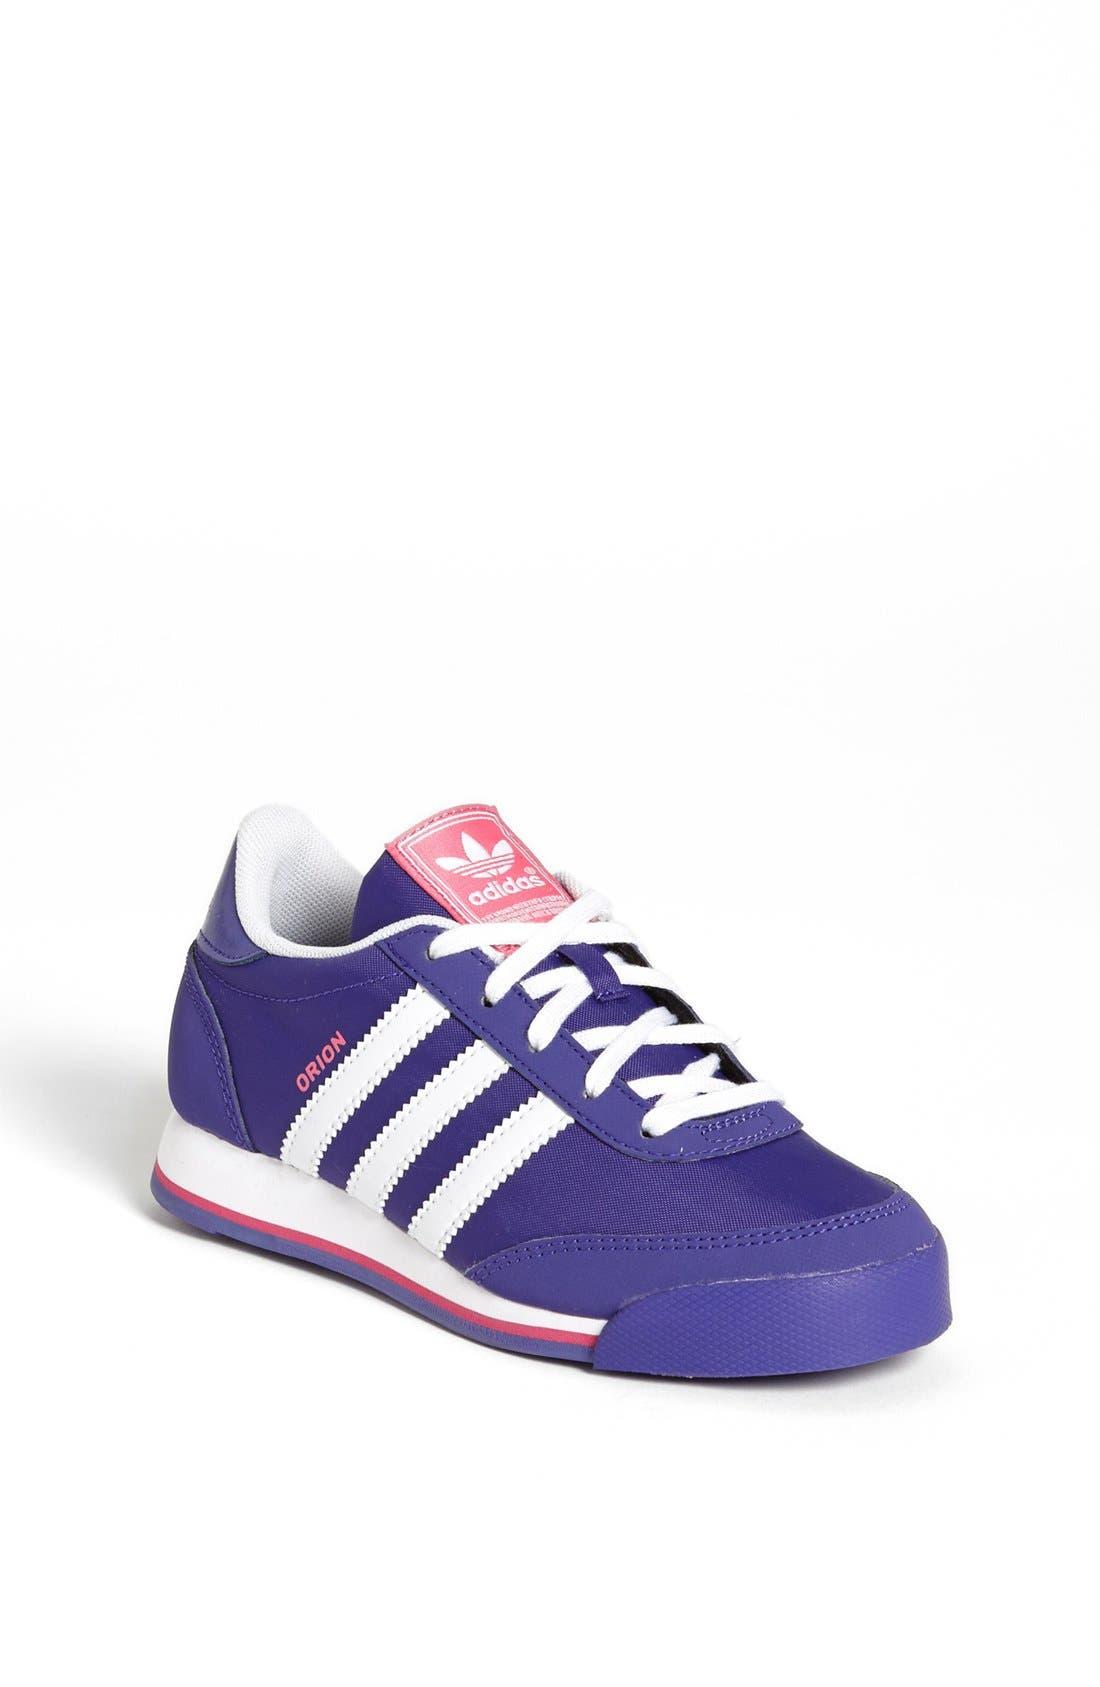 Main Image - adidas 'Orion 2' Sneaker (Walker, Toddler & Little Kid)